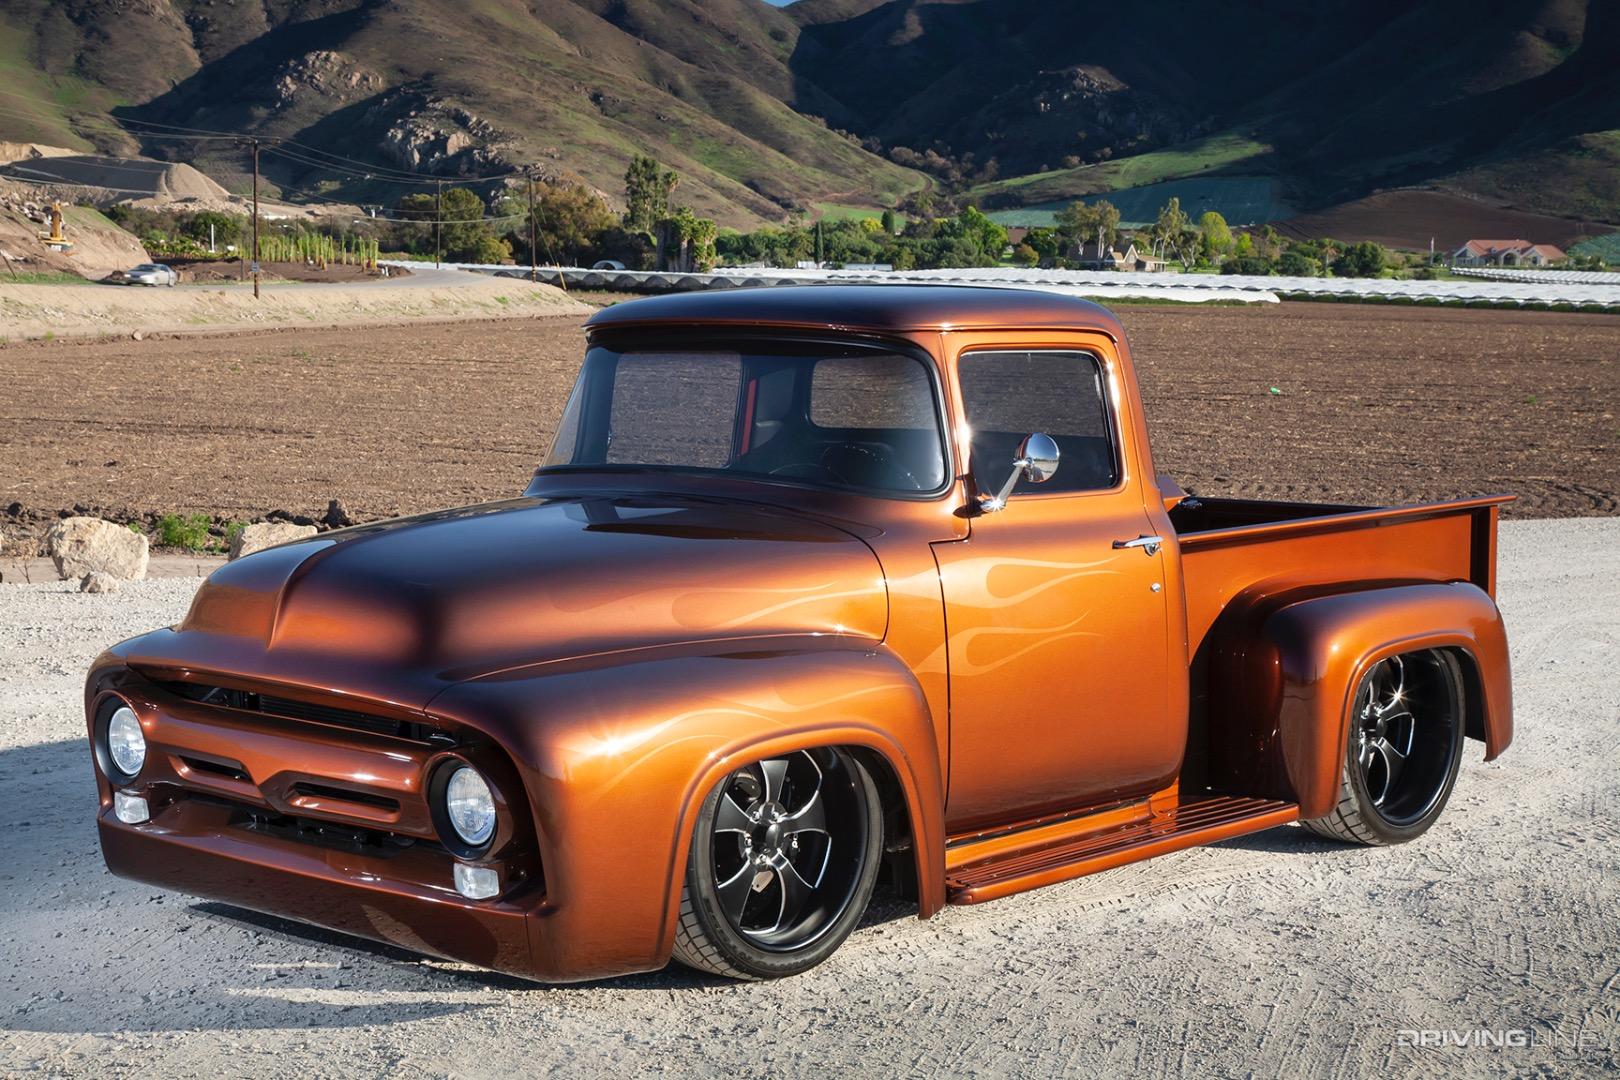 Stunning Slammed 56 Ford F 100 Pickup Truck Drivingline